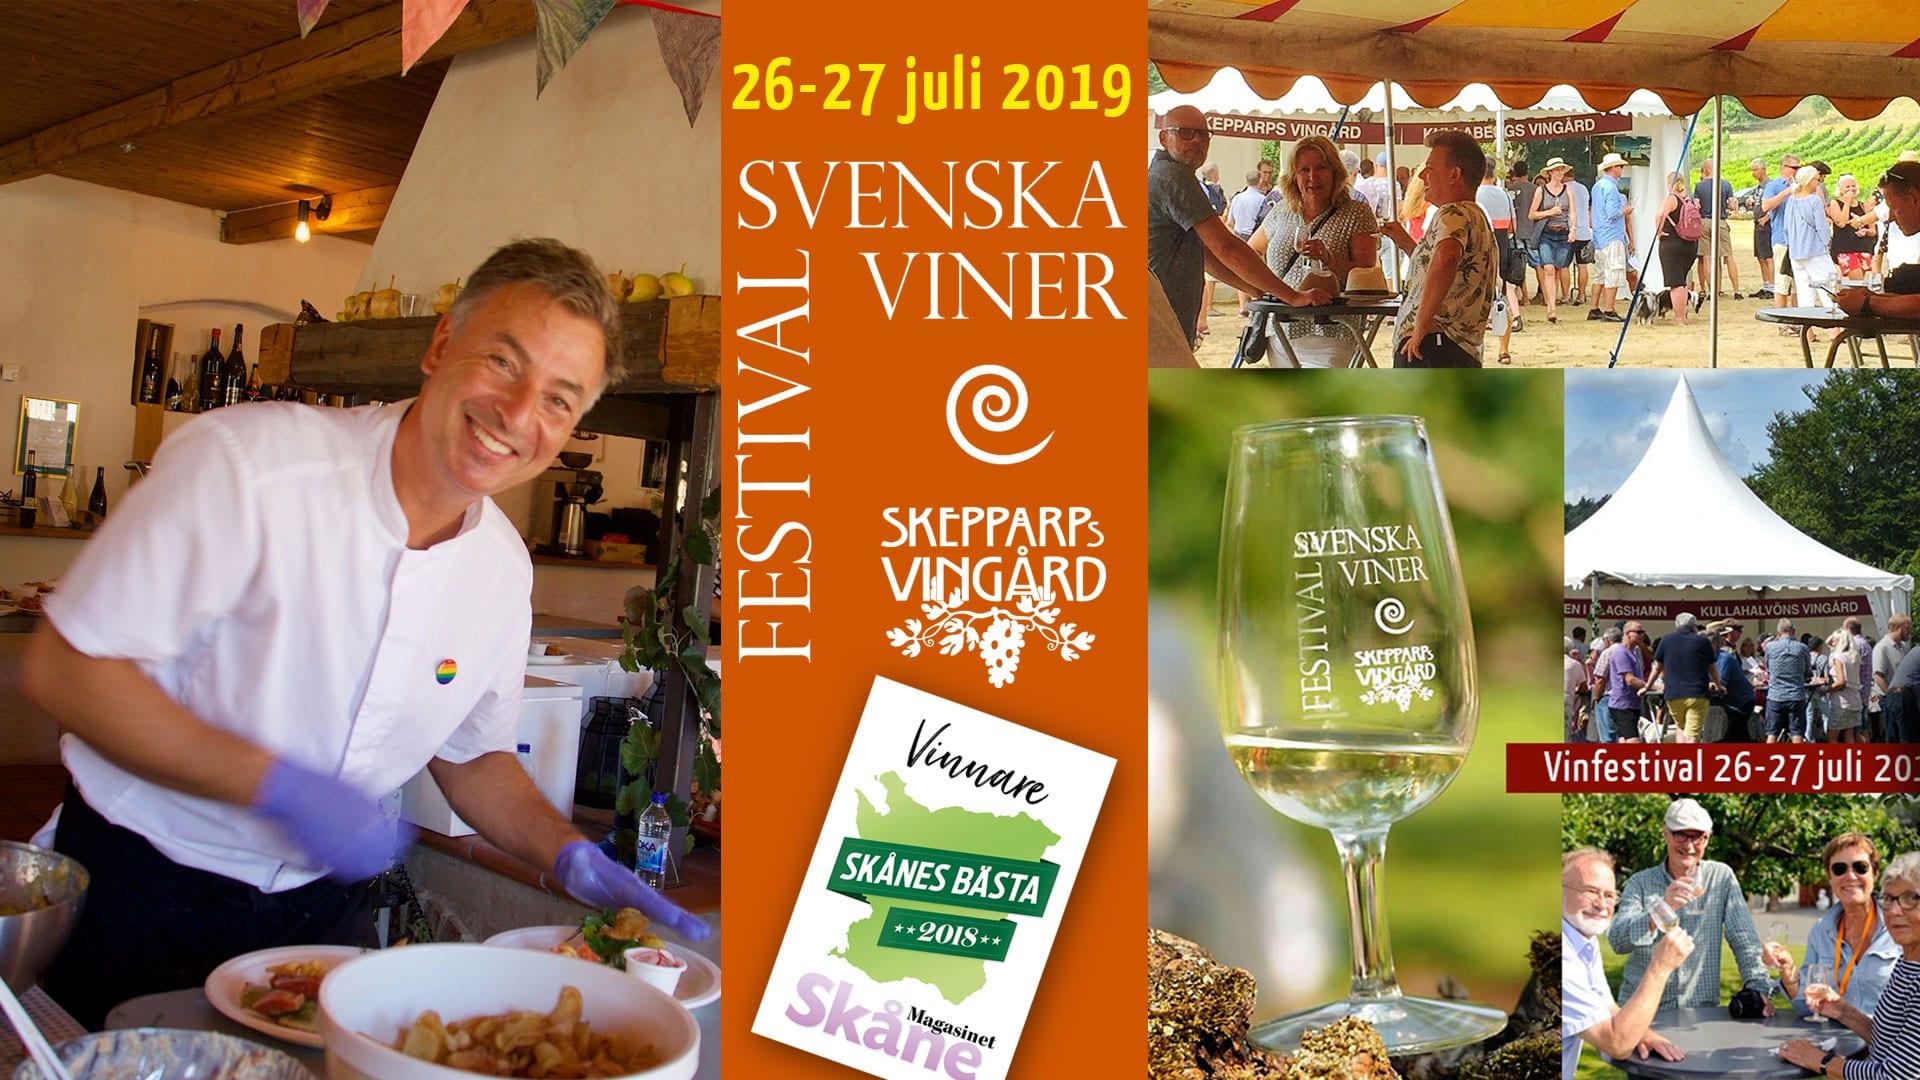 Vinfestivalen 2019 Skepparps Vingård